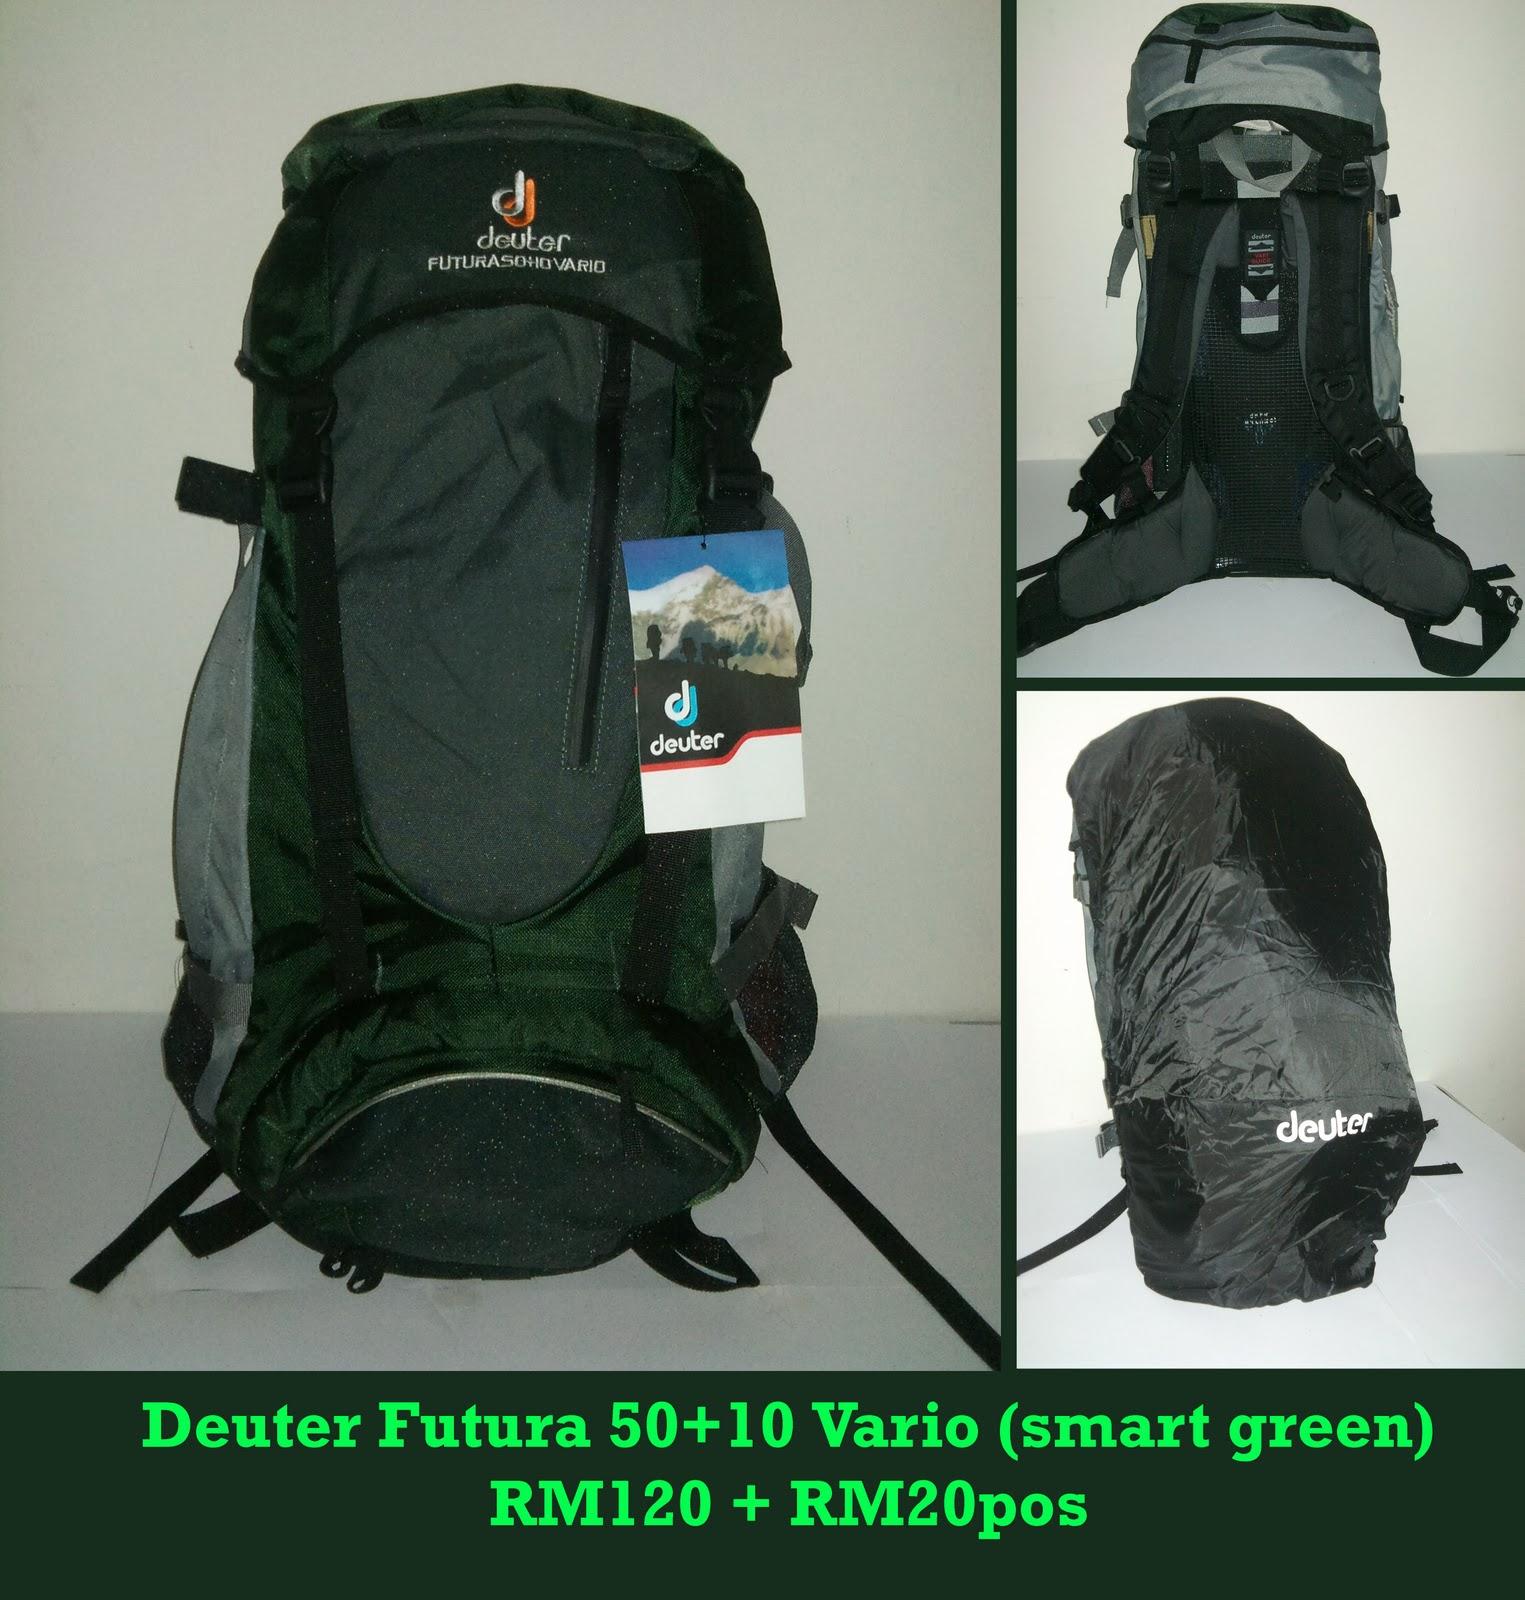 mna nasara enterprise high quality deuter backpack deuter futura 50 10 vario. Black Bedroom Furniture Sets. Home Design Ideas